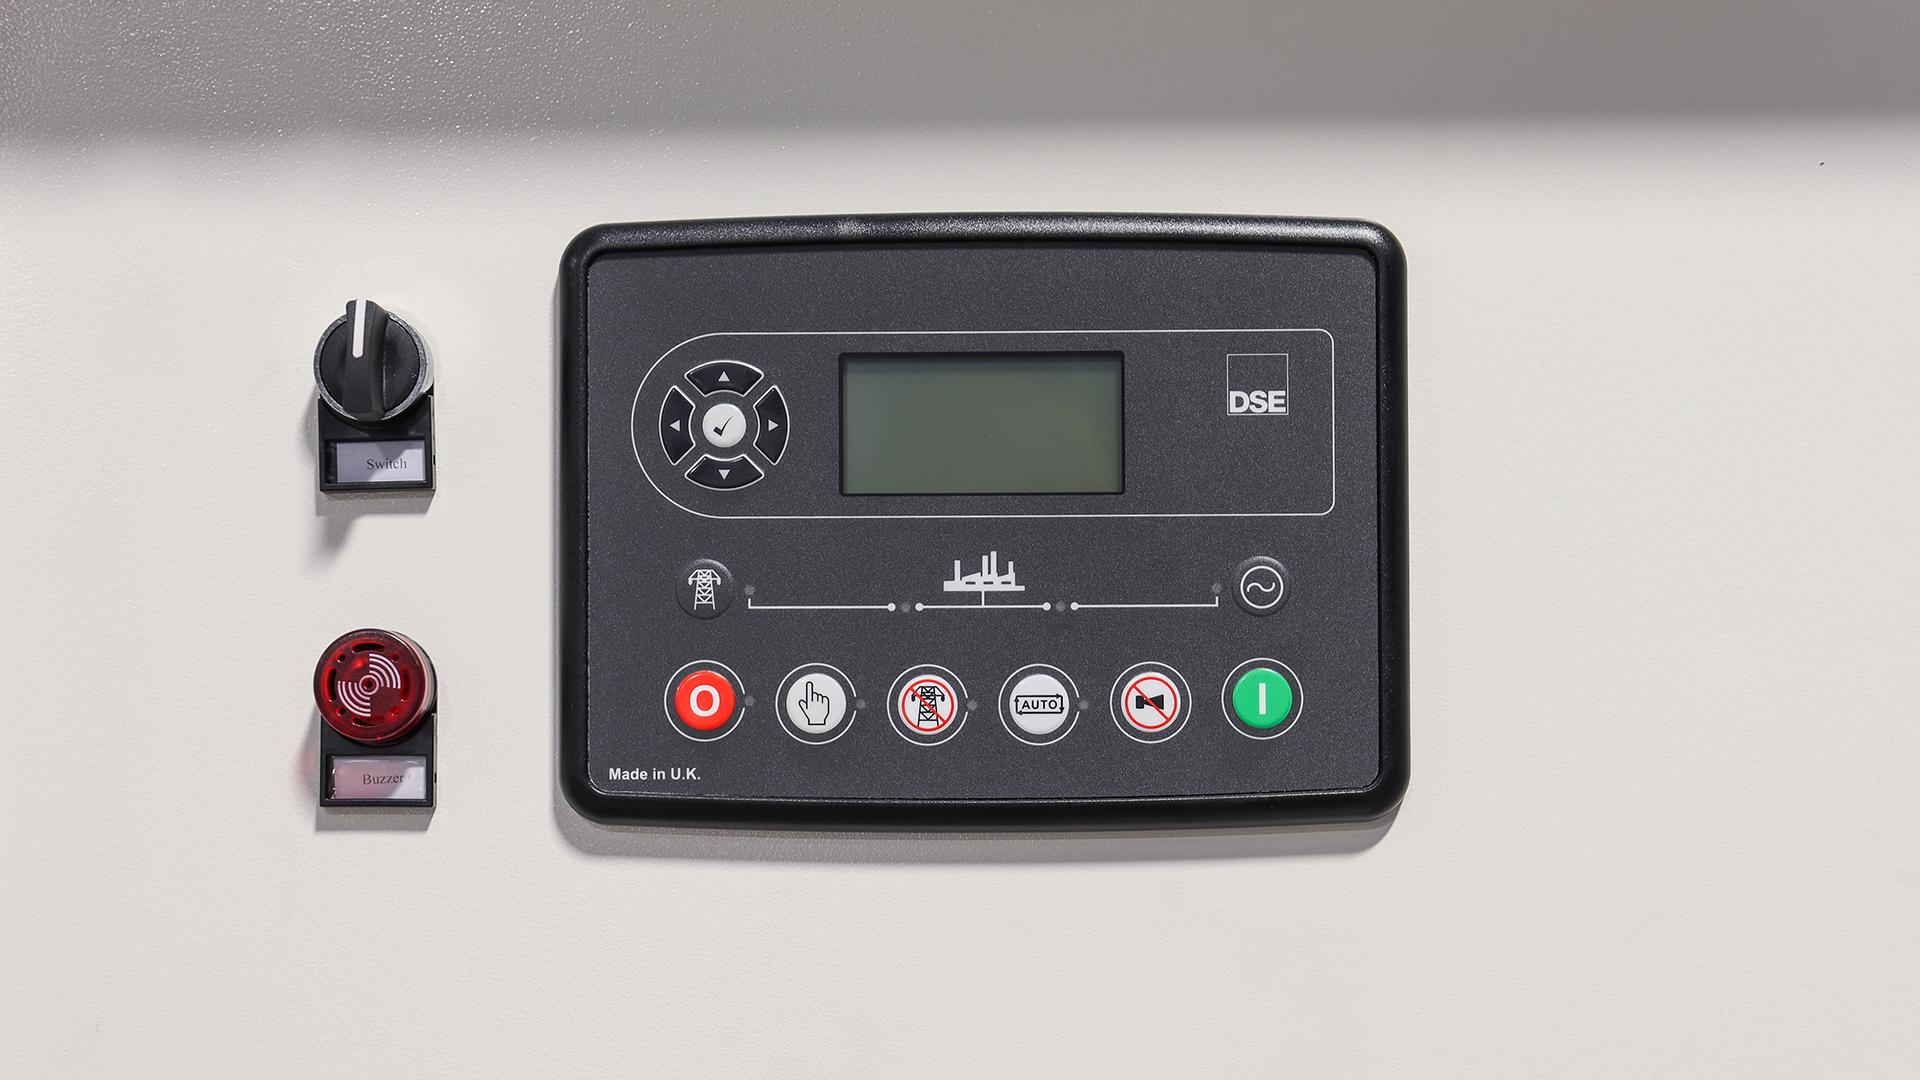 DeepSeaElectronics DSE6120 MkII Control Panel